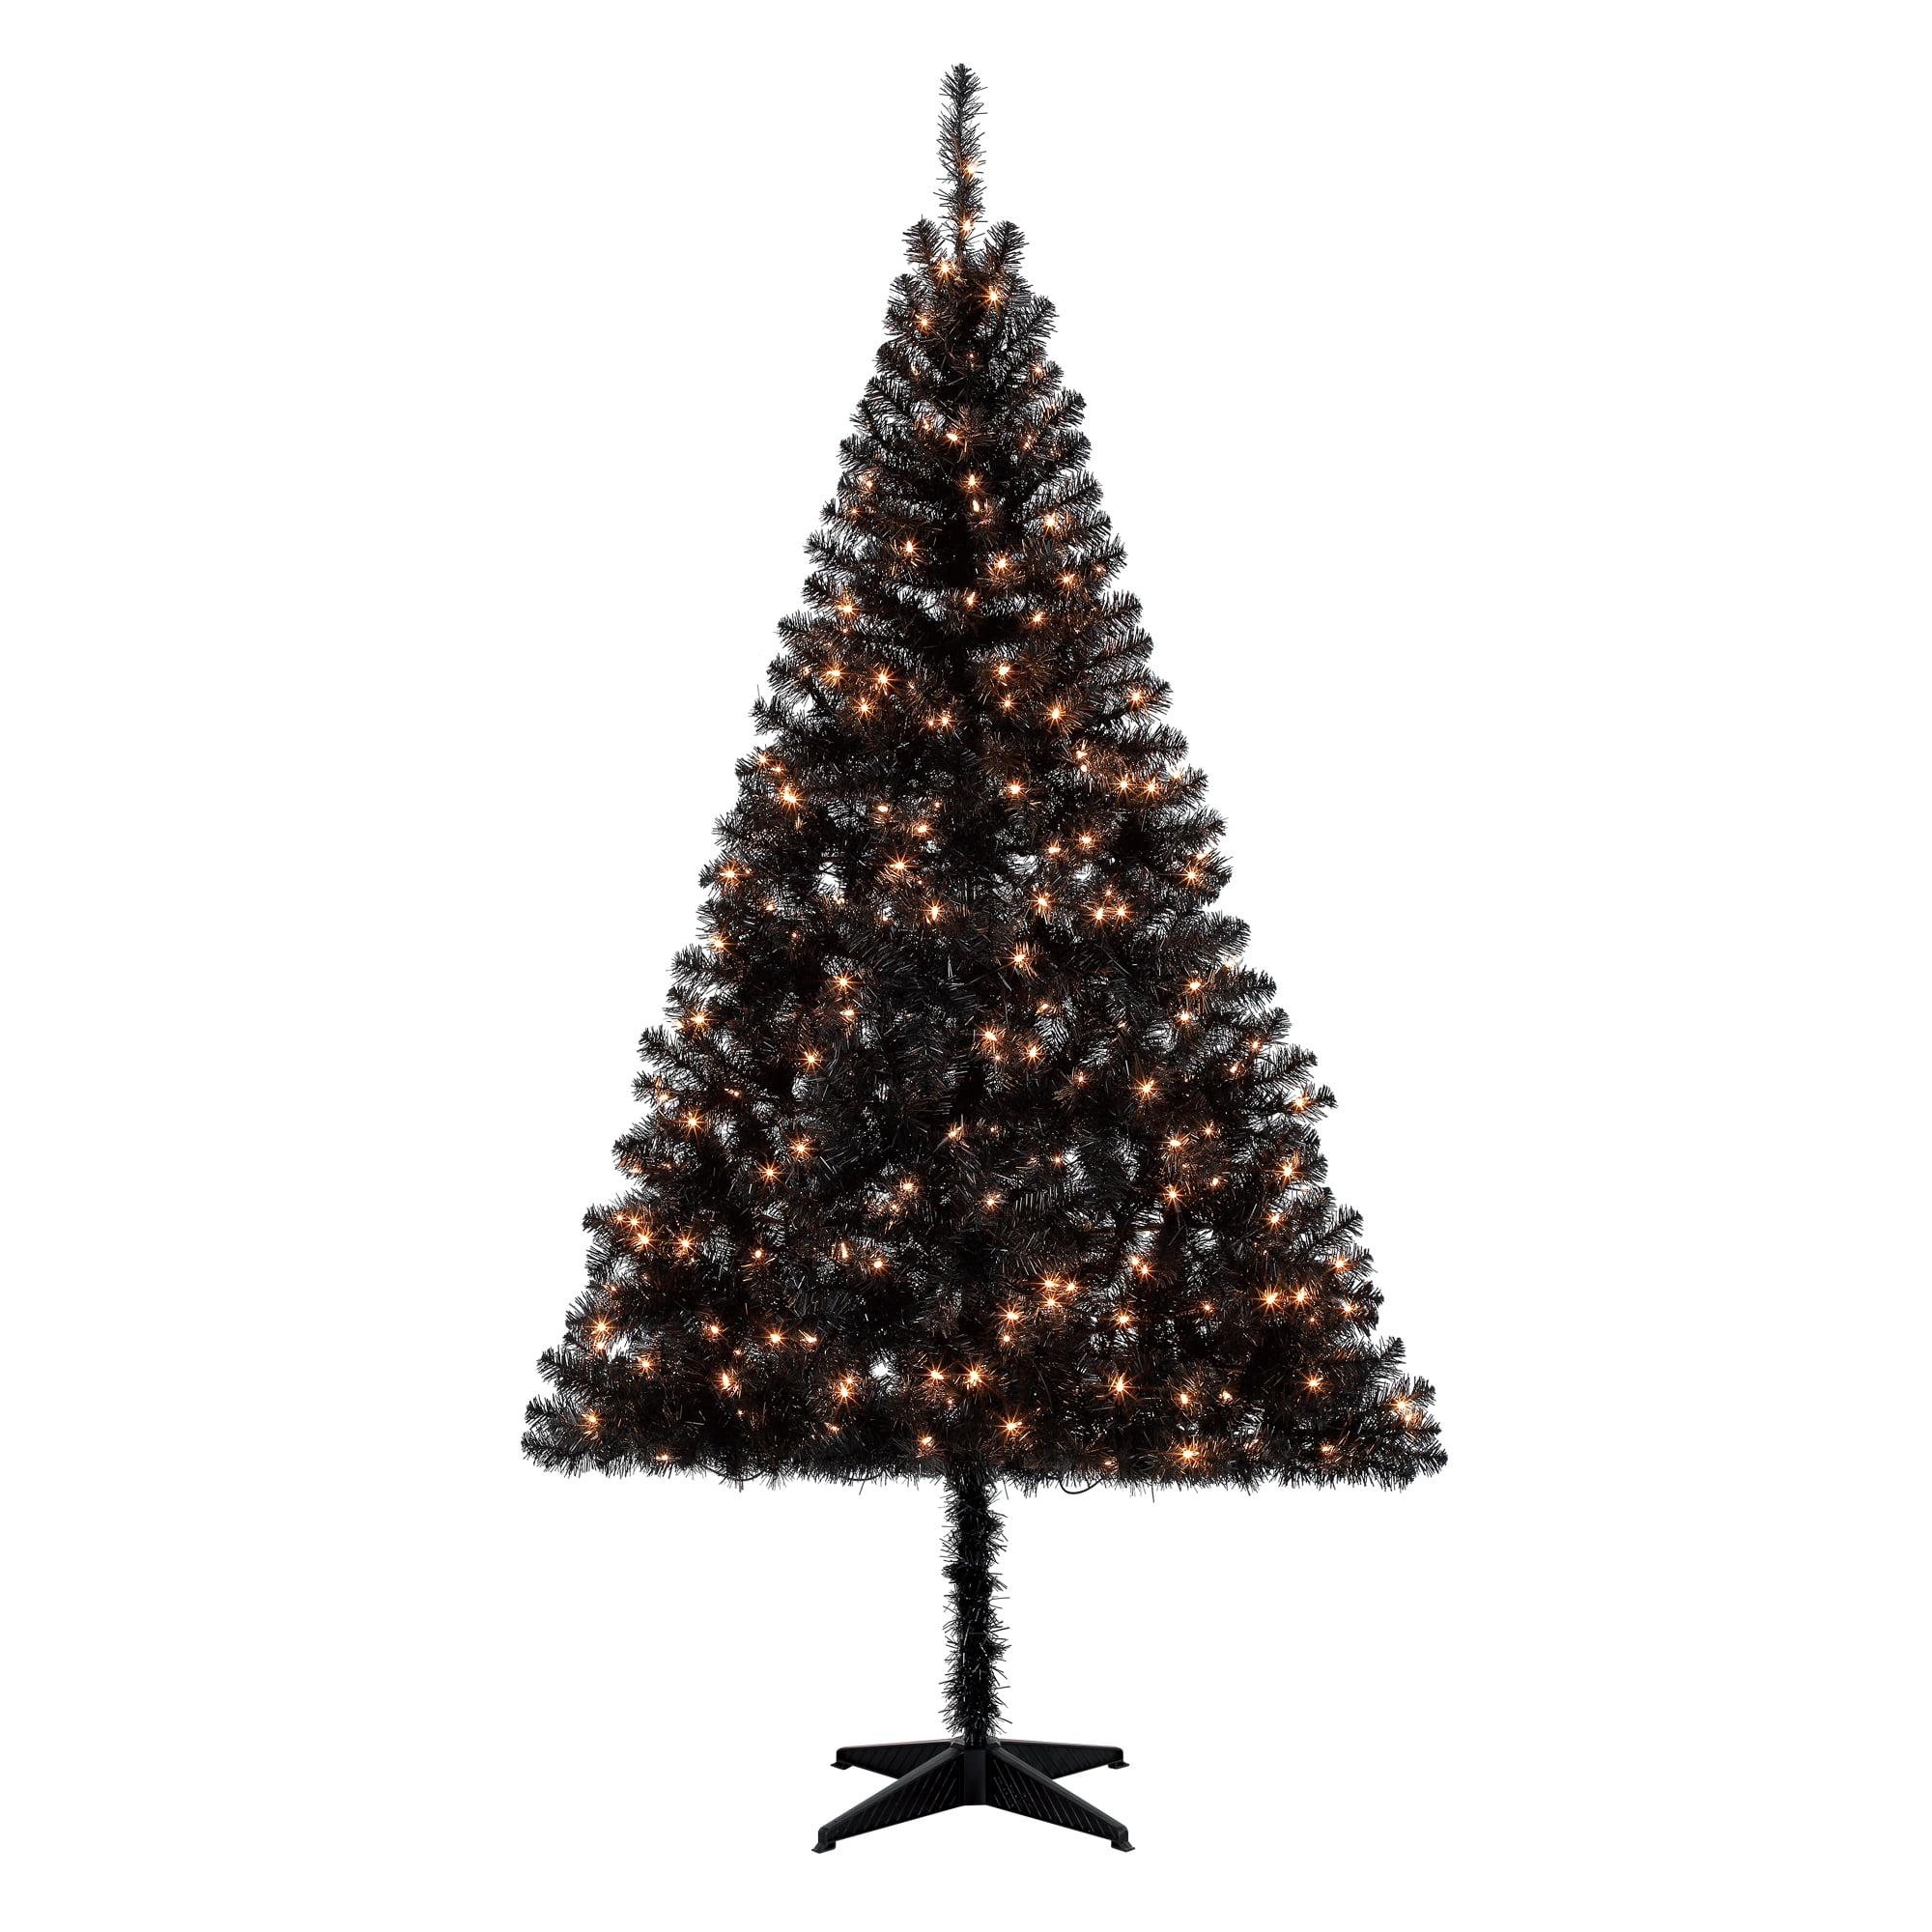 Madison Pine Christmas Tree: Holiday Time Pre-Lit 6.5' Madison Pine Black Artificial